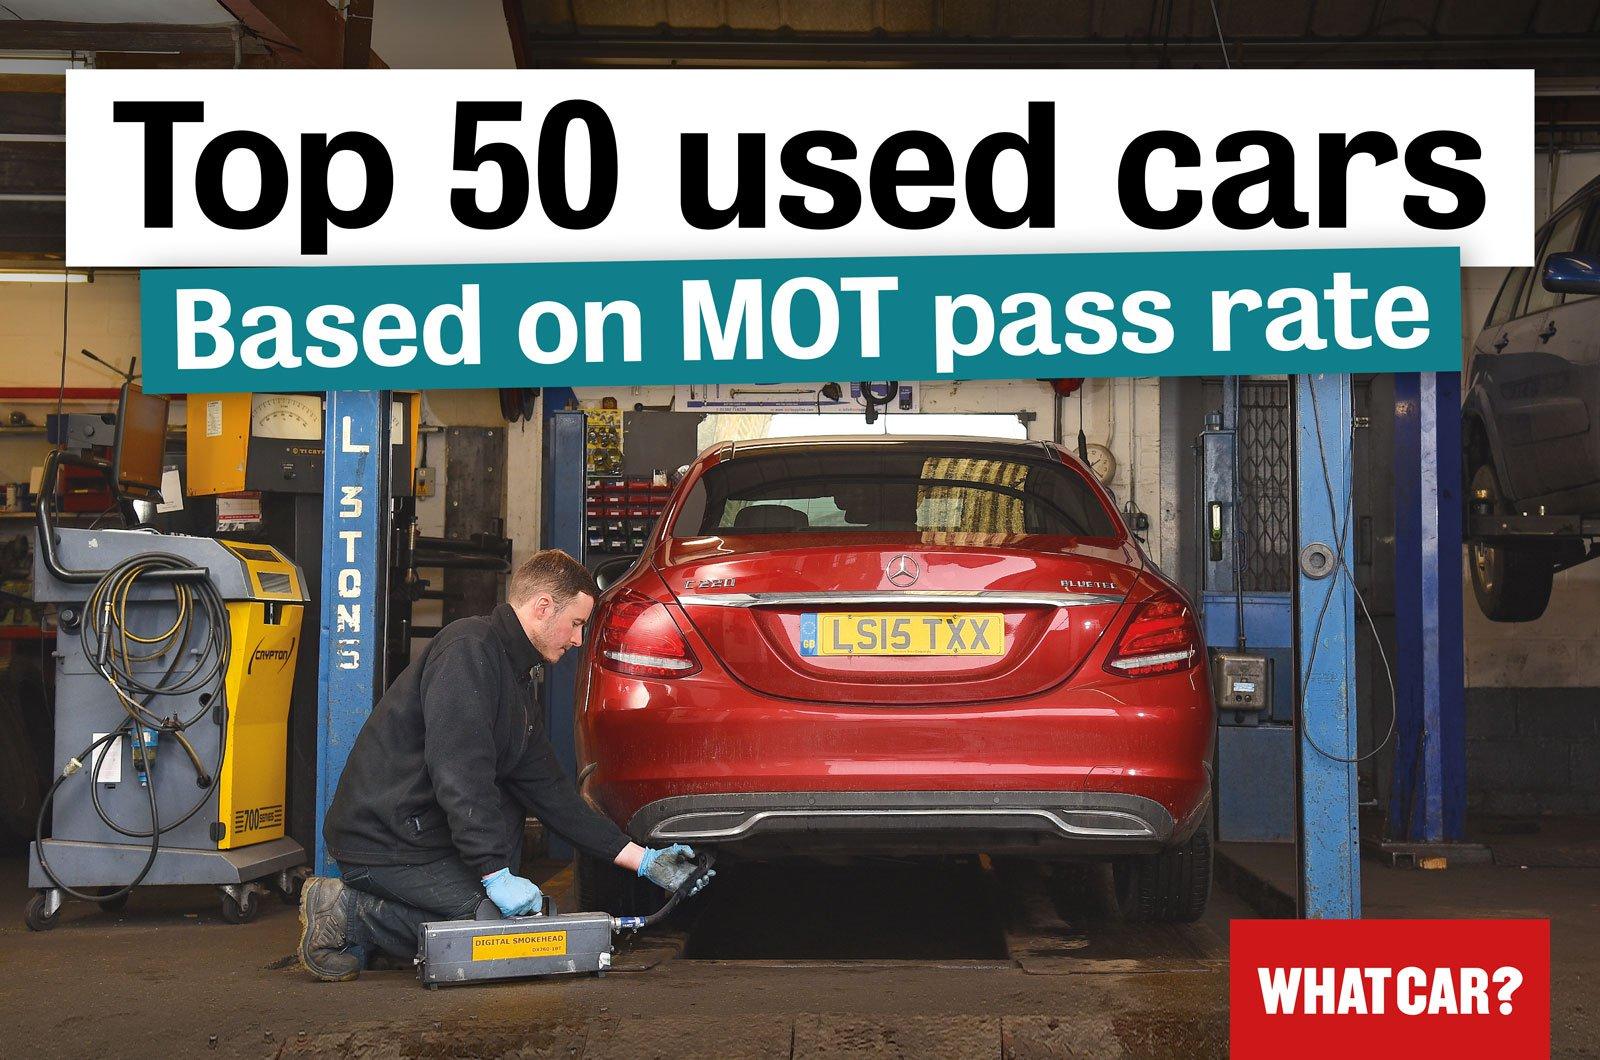 Top 50 cars for MOT pass